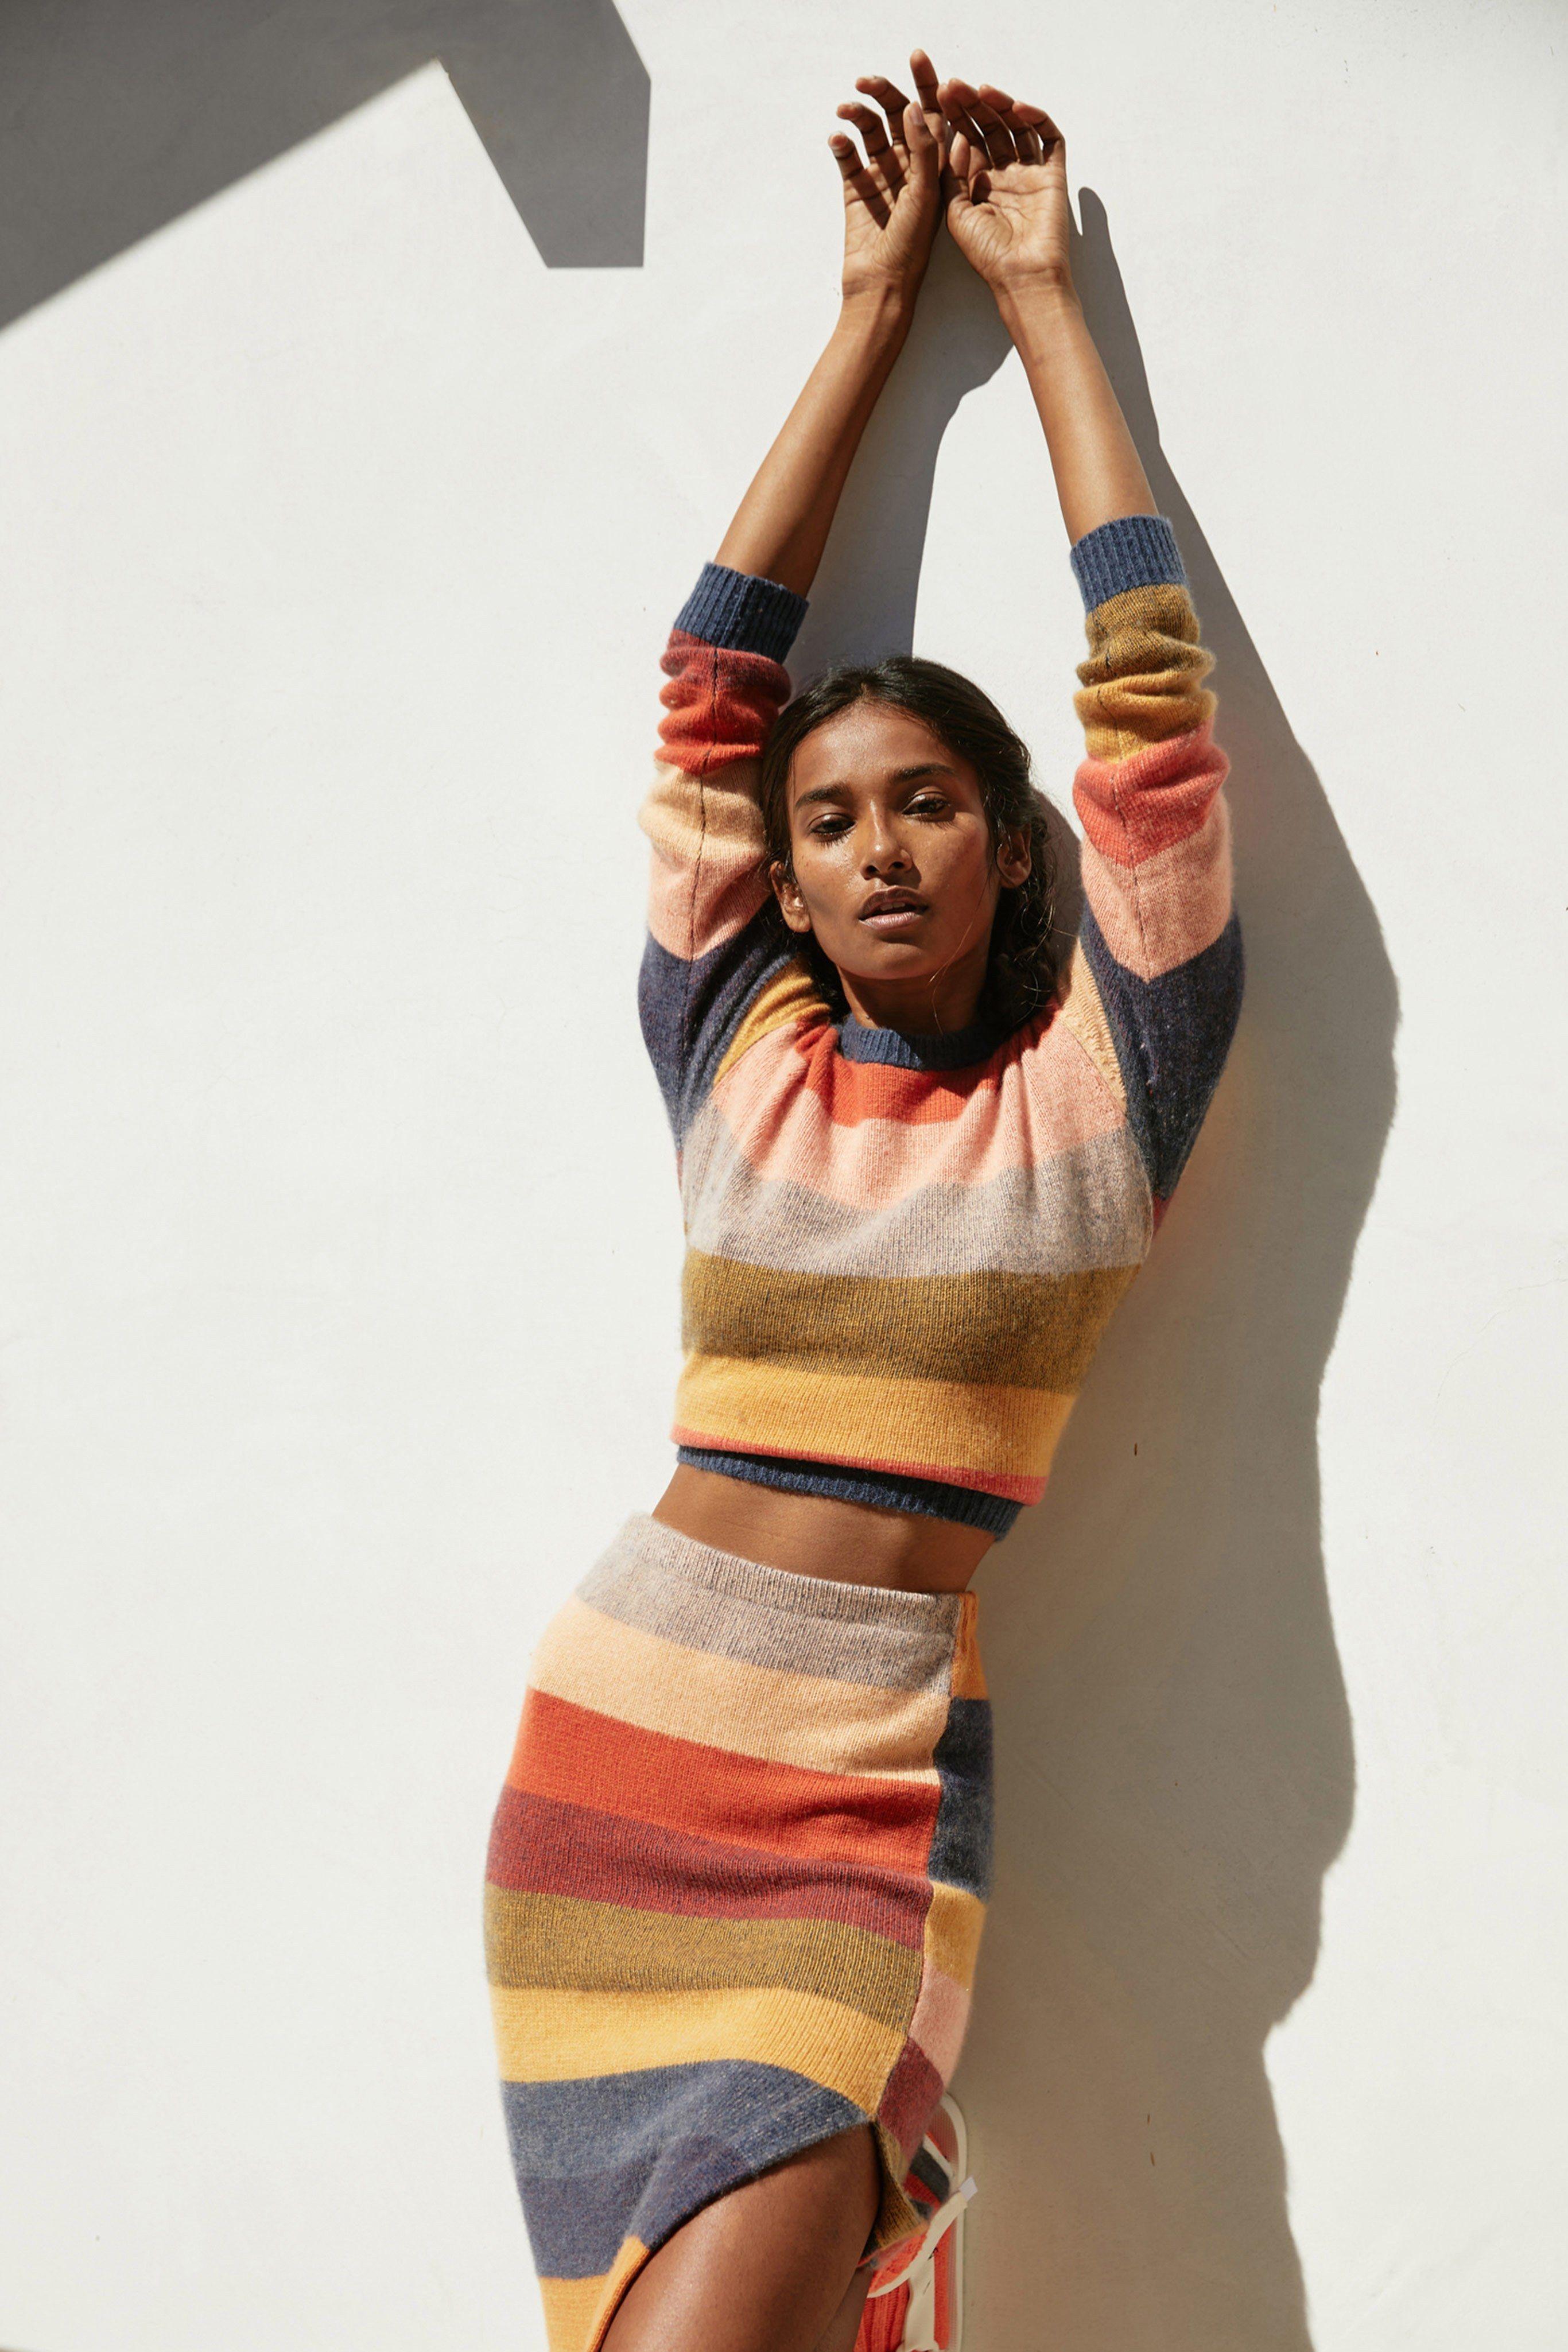 The Elder Statesman Spring 2019 Ready-to-Wear Fashion Show The complete The Elder Statesman Spring 2019 Ready-to-Wear fashion show now on Vogue Runway. #summerdresses